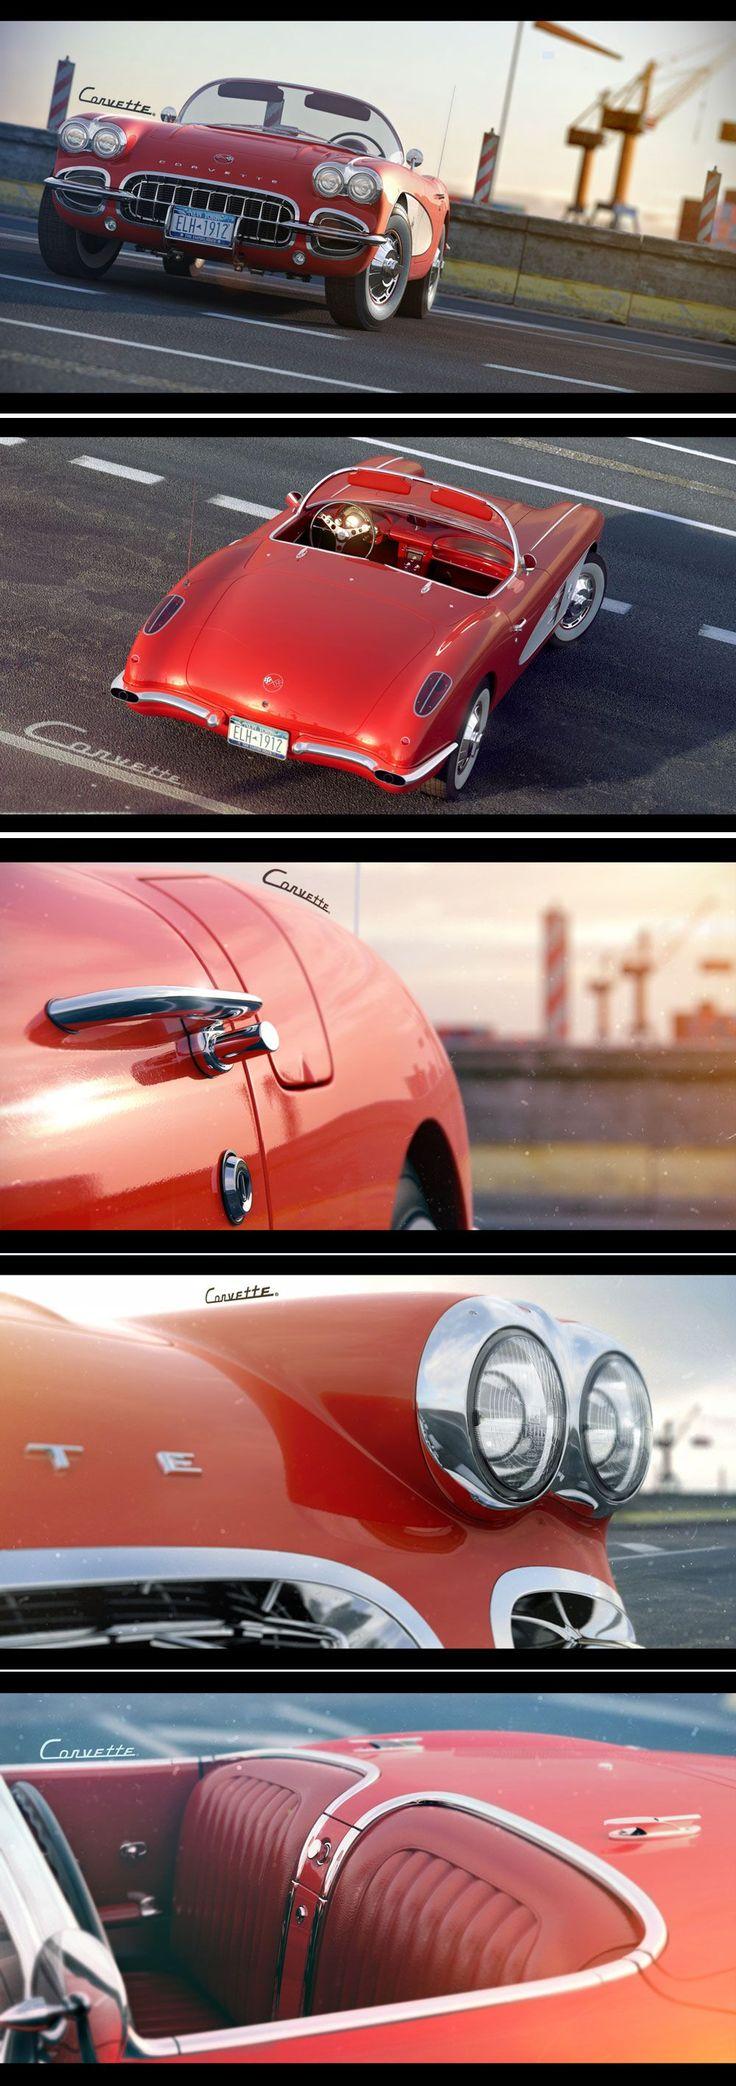 Corvette. Add a luggage rack, and I'll take it! Just sayin'...... #chevroletcorvette1958